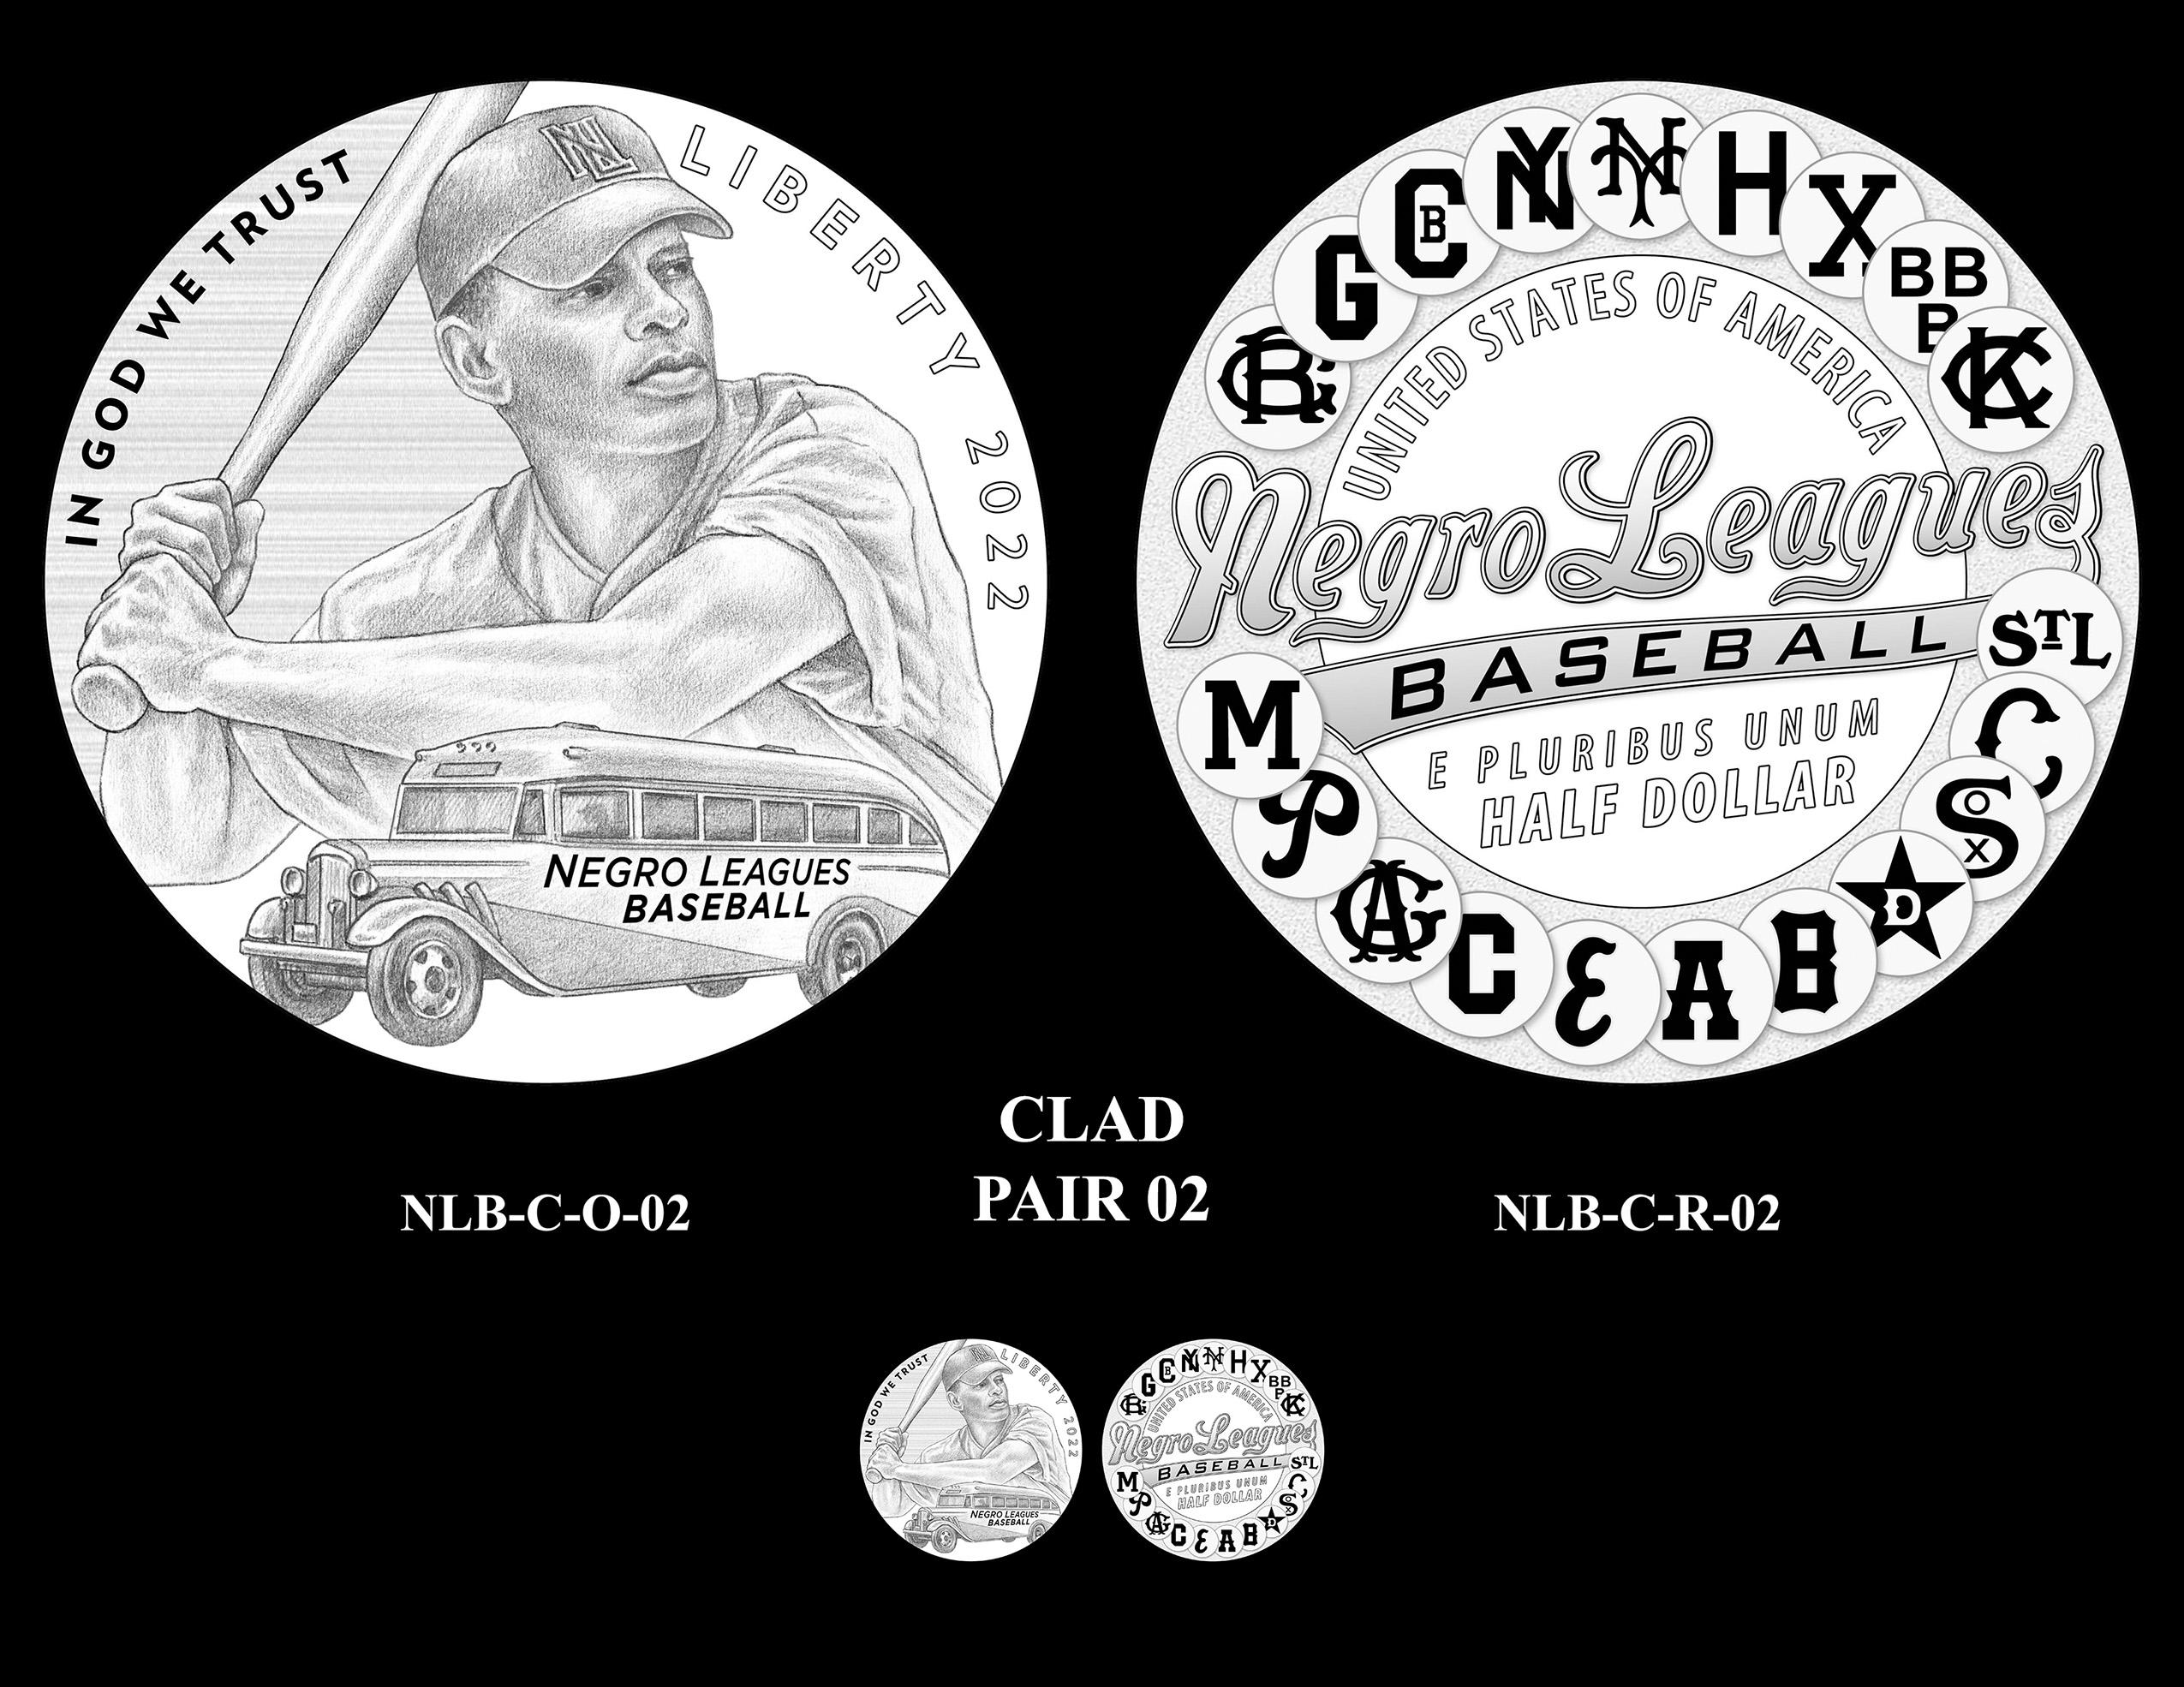 Clad Pair 02 -- Negro Leagues Baseball Commemorative Coin Program